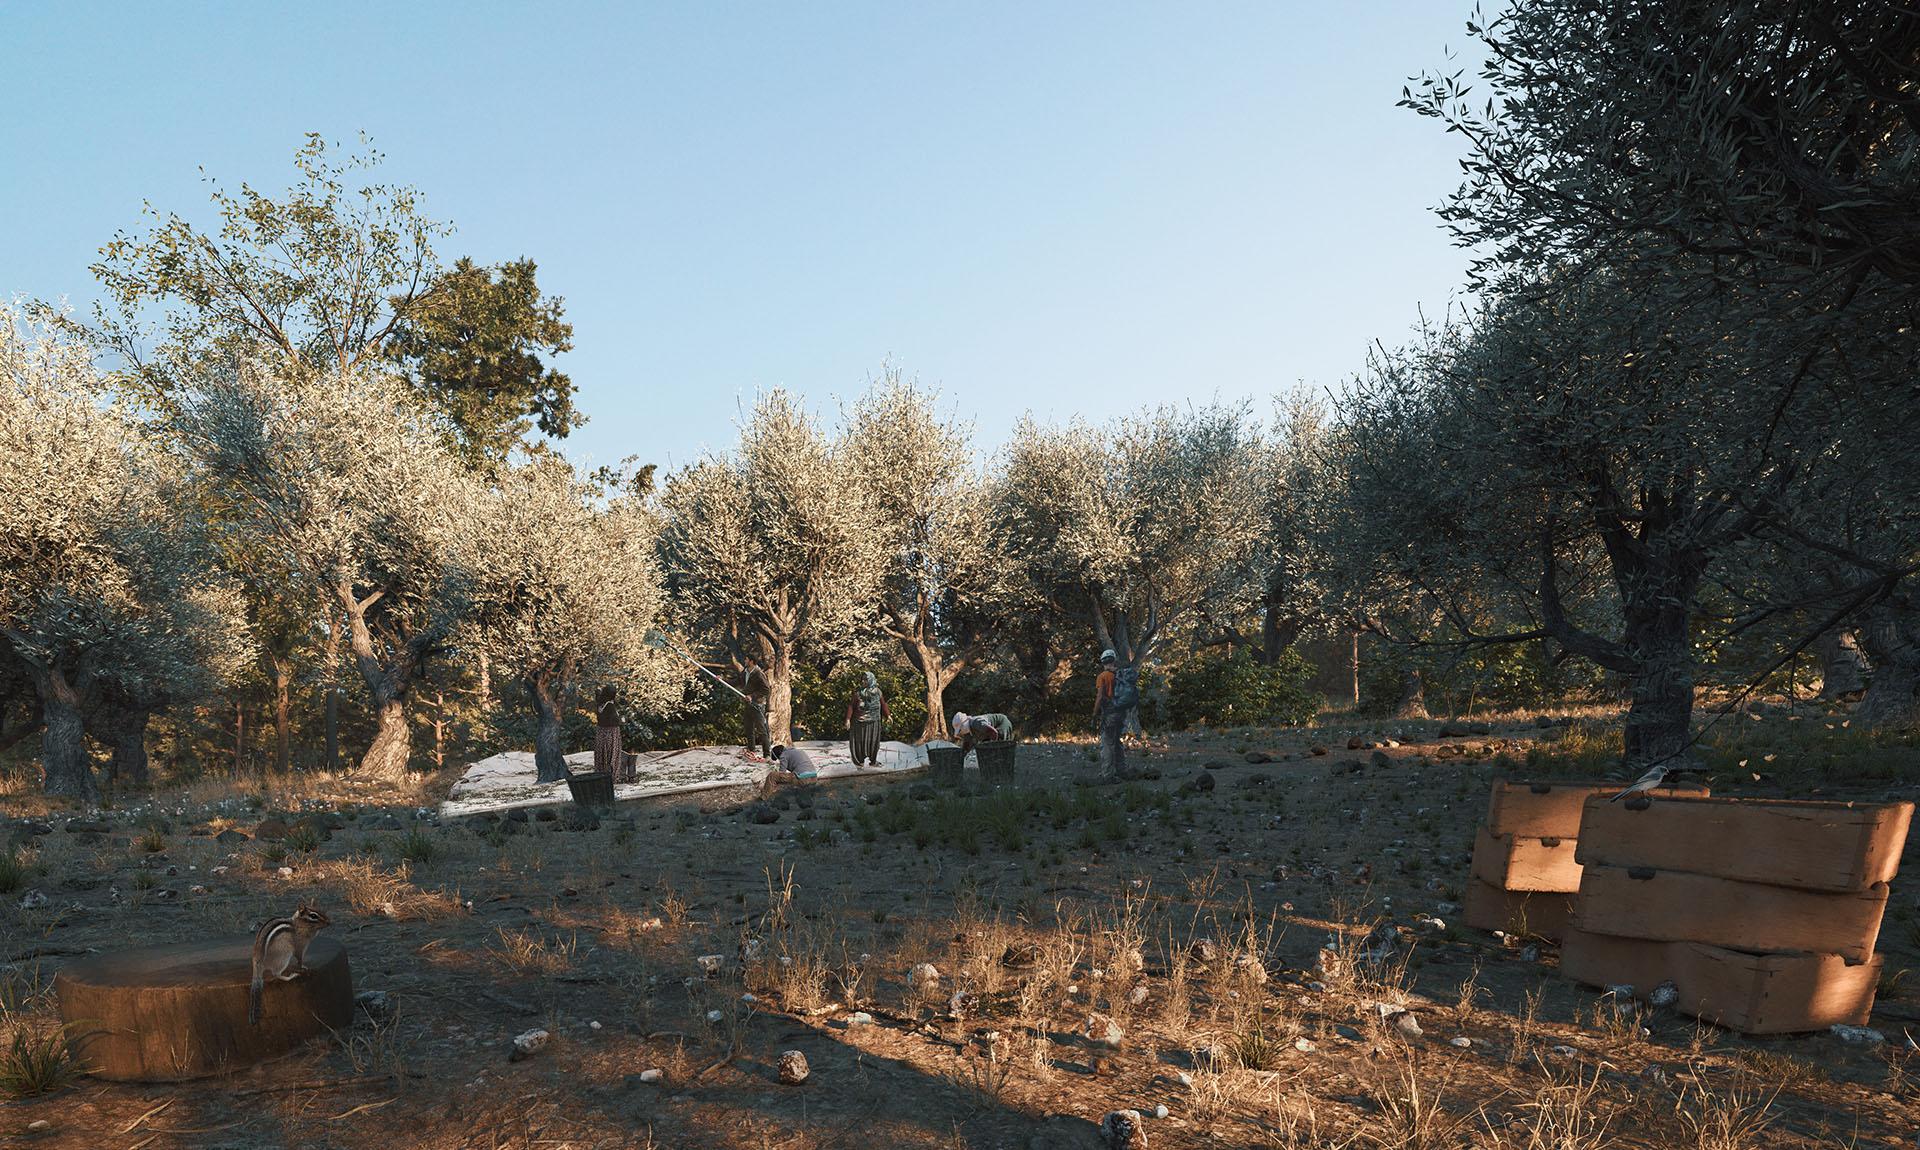 render_ivabox_Frea_izmir_olivelo_competition_8